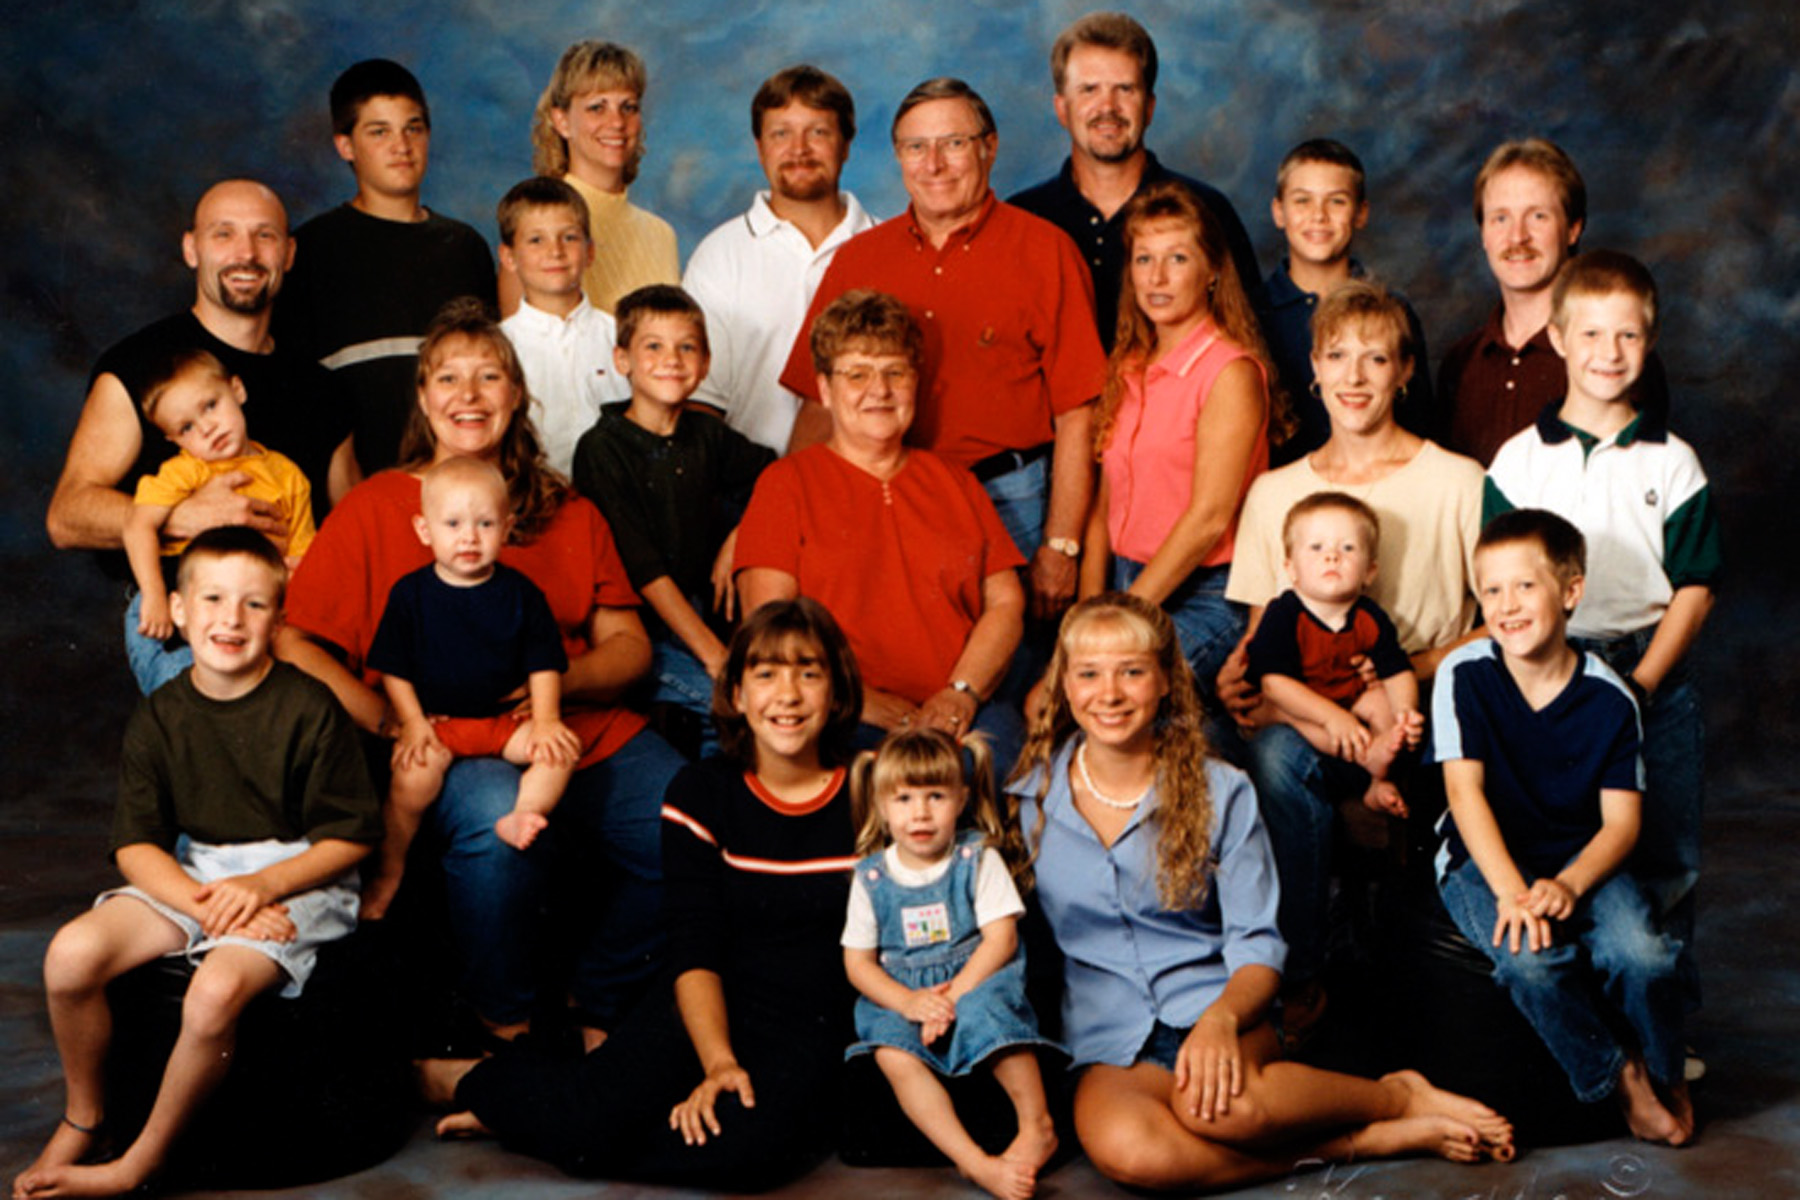 KenMar Photography Blog: PREPARING FOR YOUR FAMILY PORTRAIT